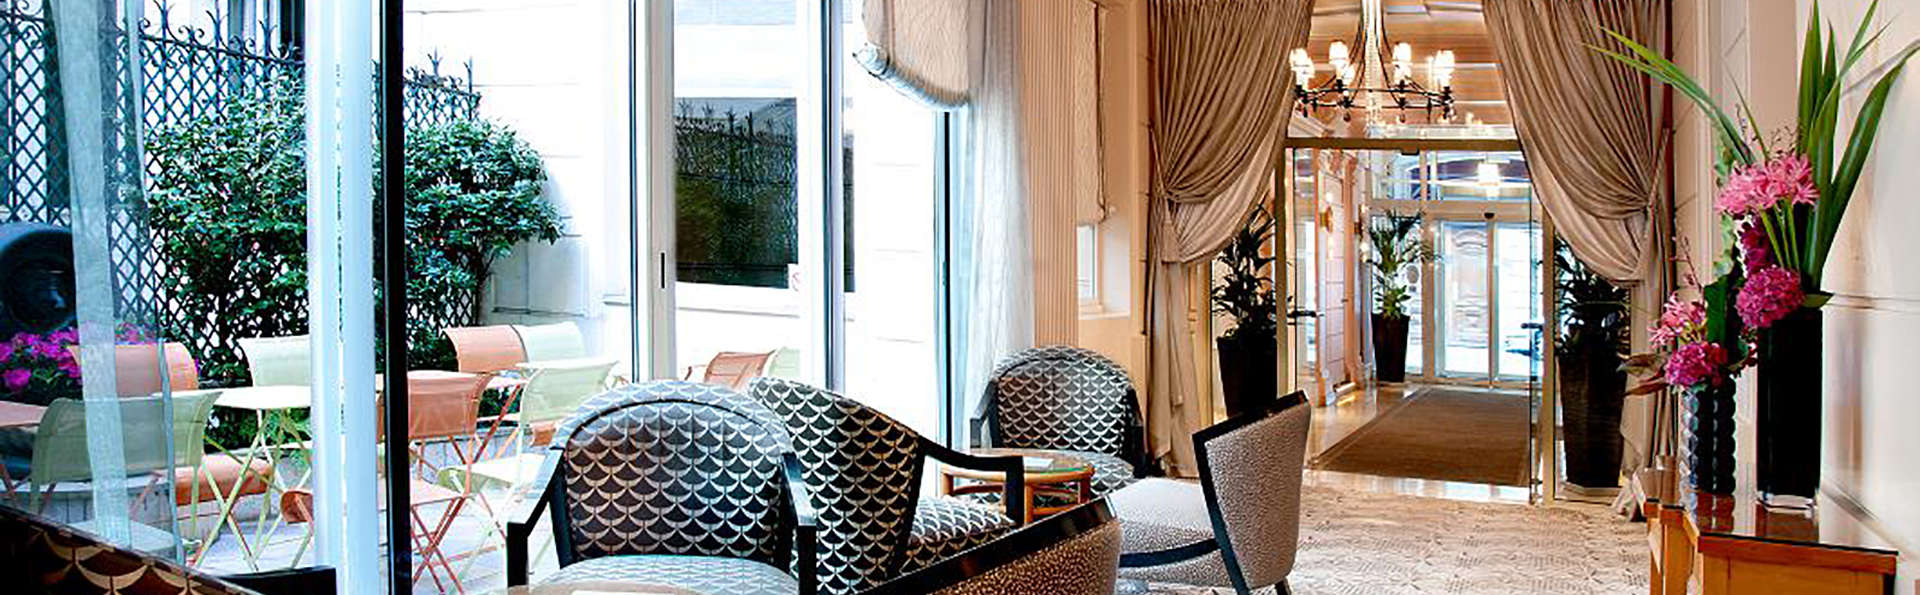 Hôtel Le Cardinal - EDIT_Salon-d_acceuil.jpg